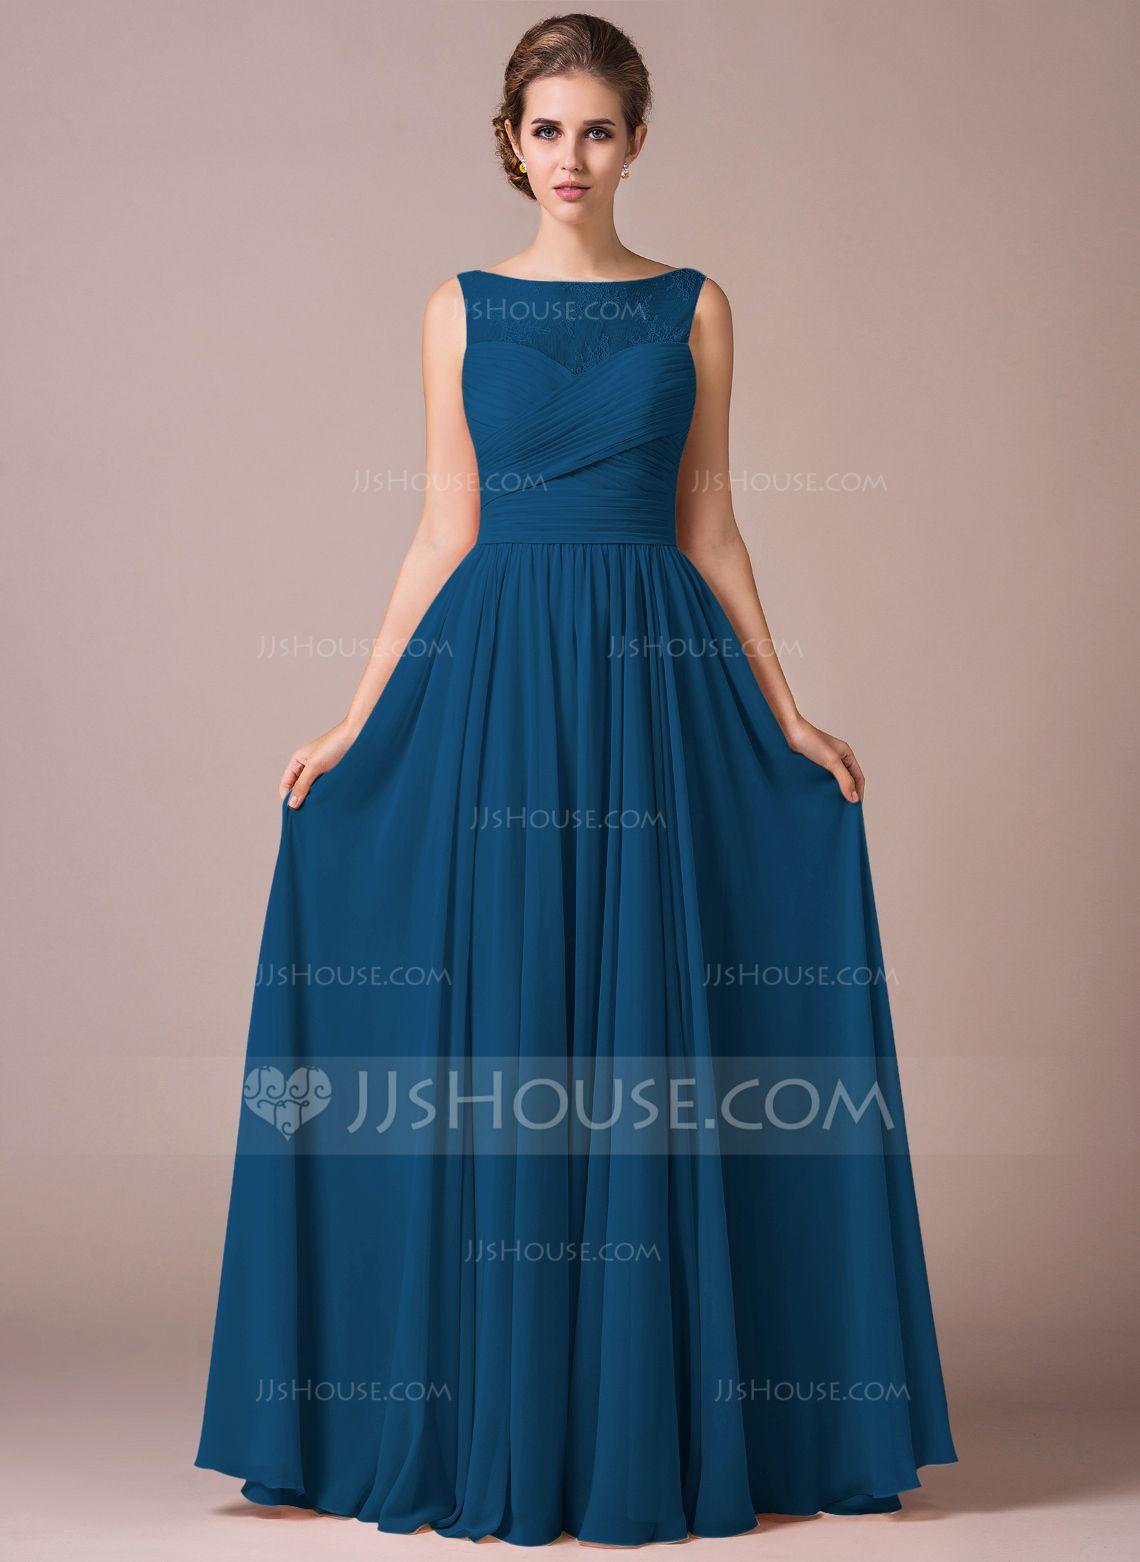 b5fc4aa27 A-Line/Princess Scoop Neck Floor-Length Chiffon Lace Bridesmaid Dress With  Ruffle (007057702) - JJsHouse